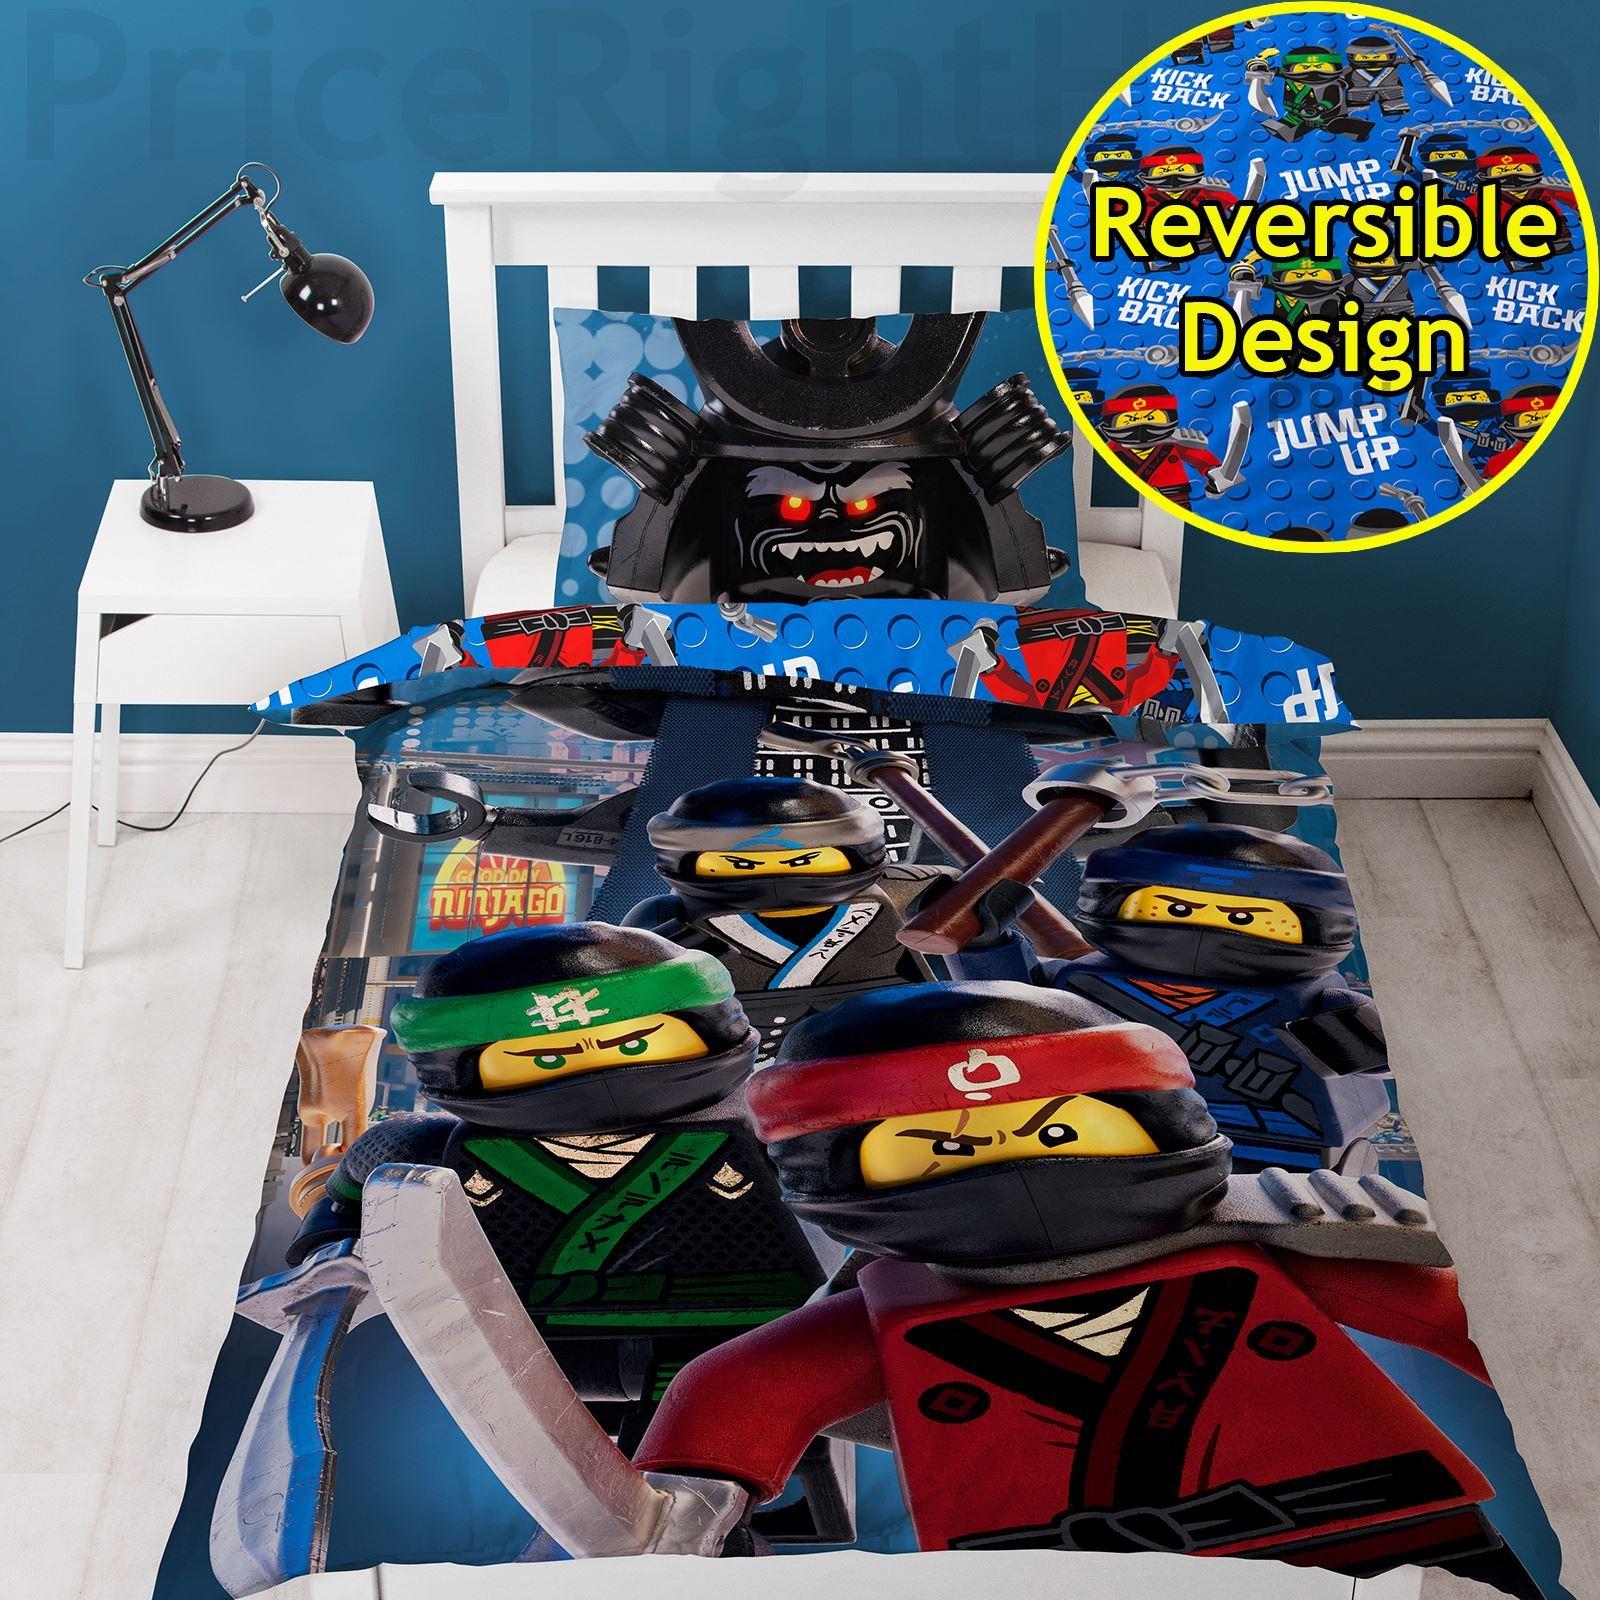 Lego Ninjago Movie Crew 2 Piece UK Single/US Twin Sheet Set, 1 x Double Sided Sheet and 1 x Pillowcase